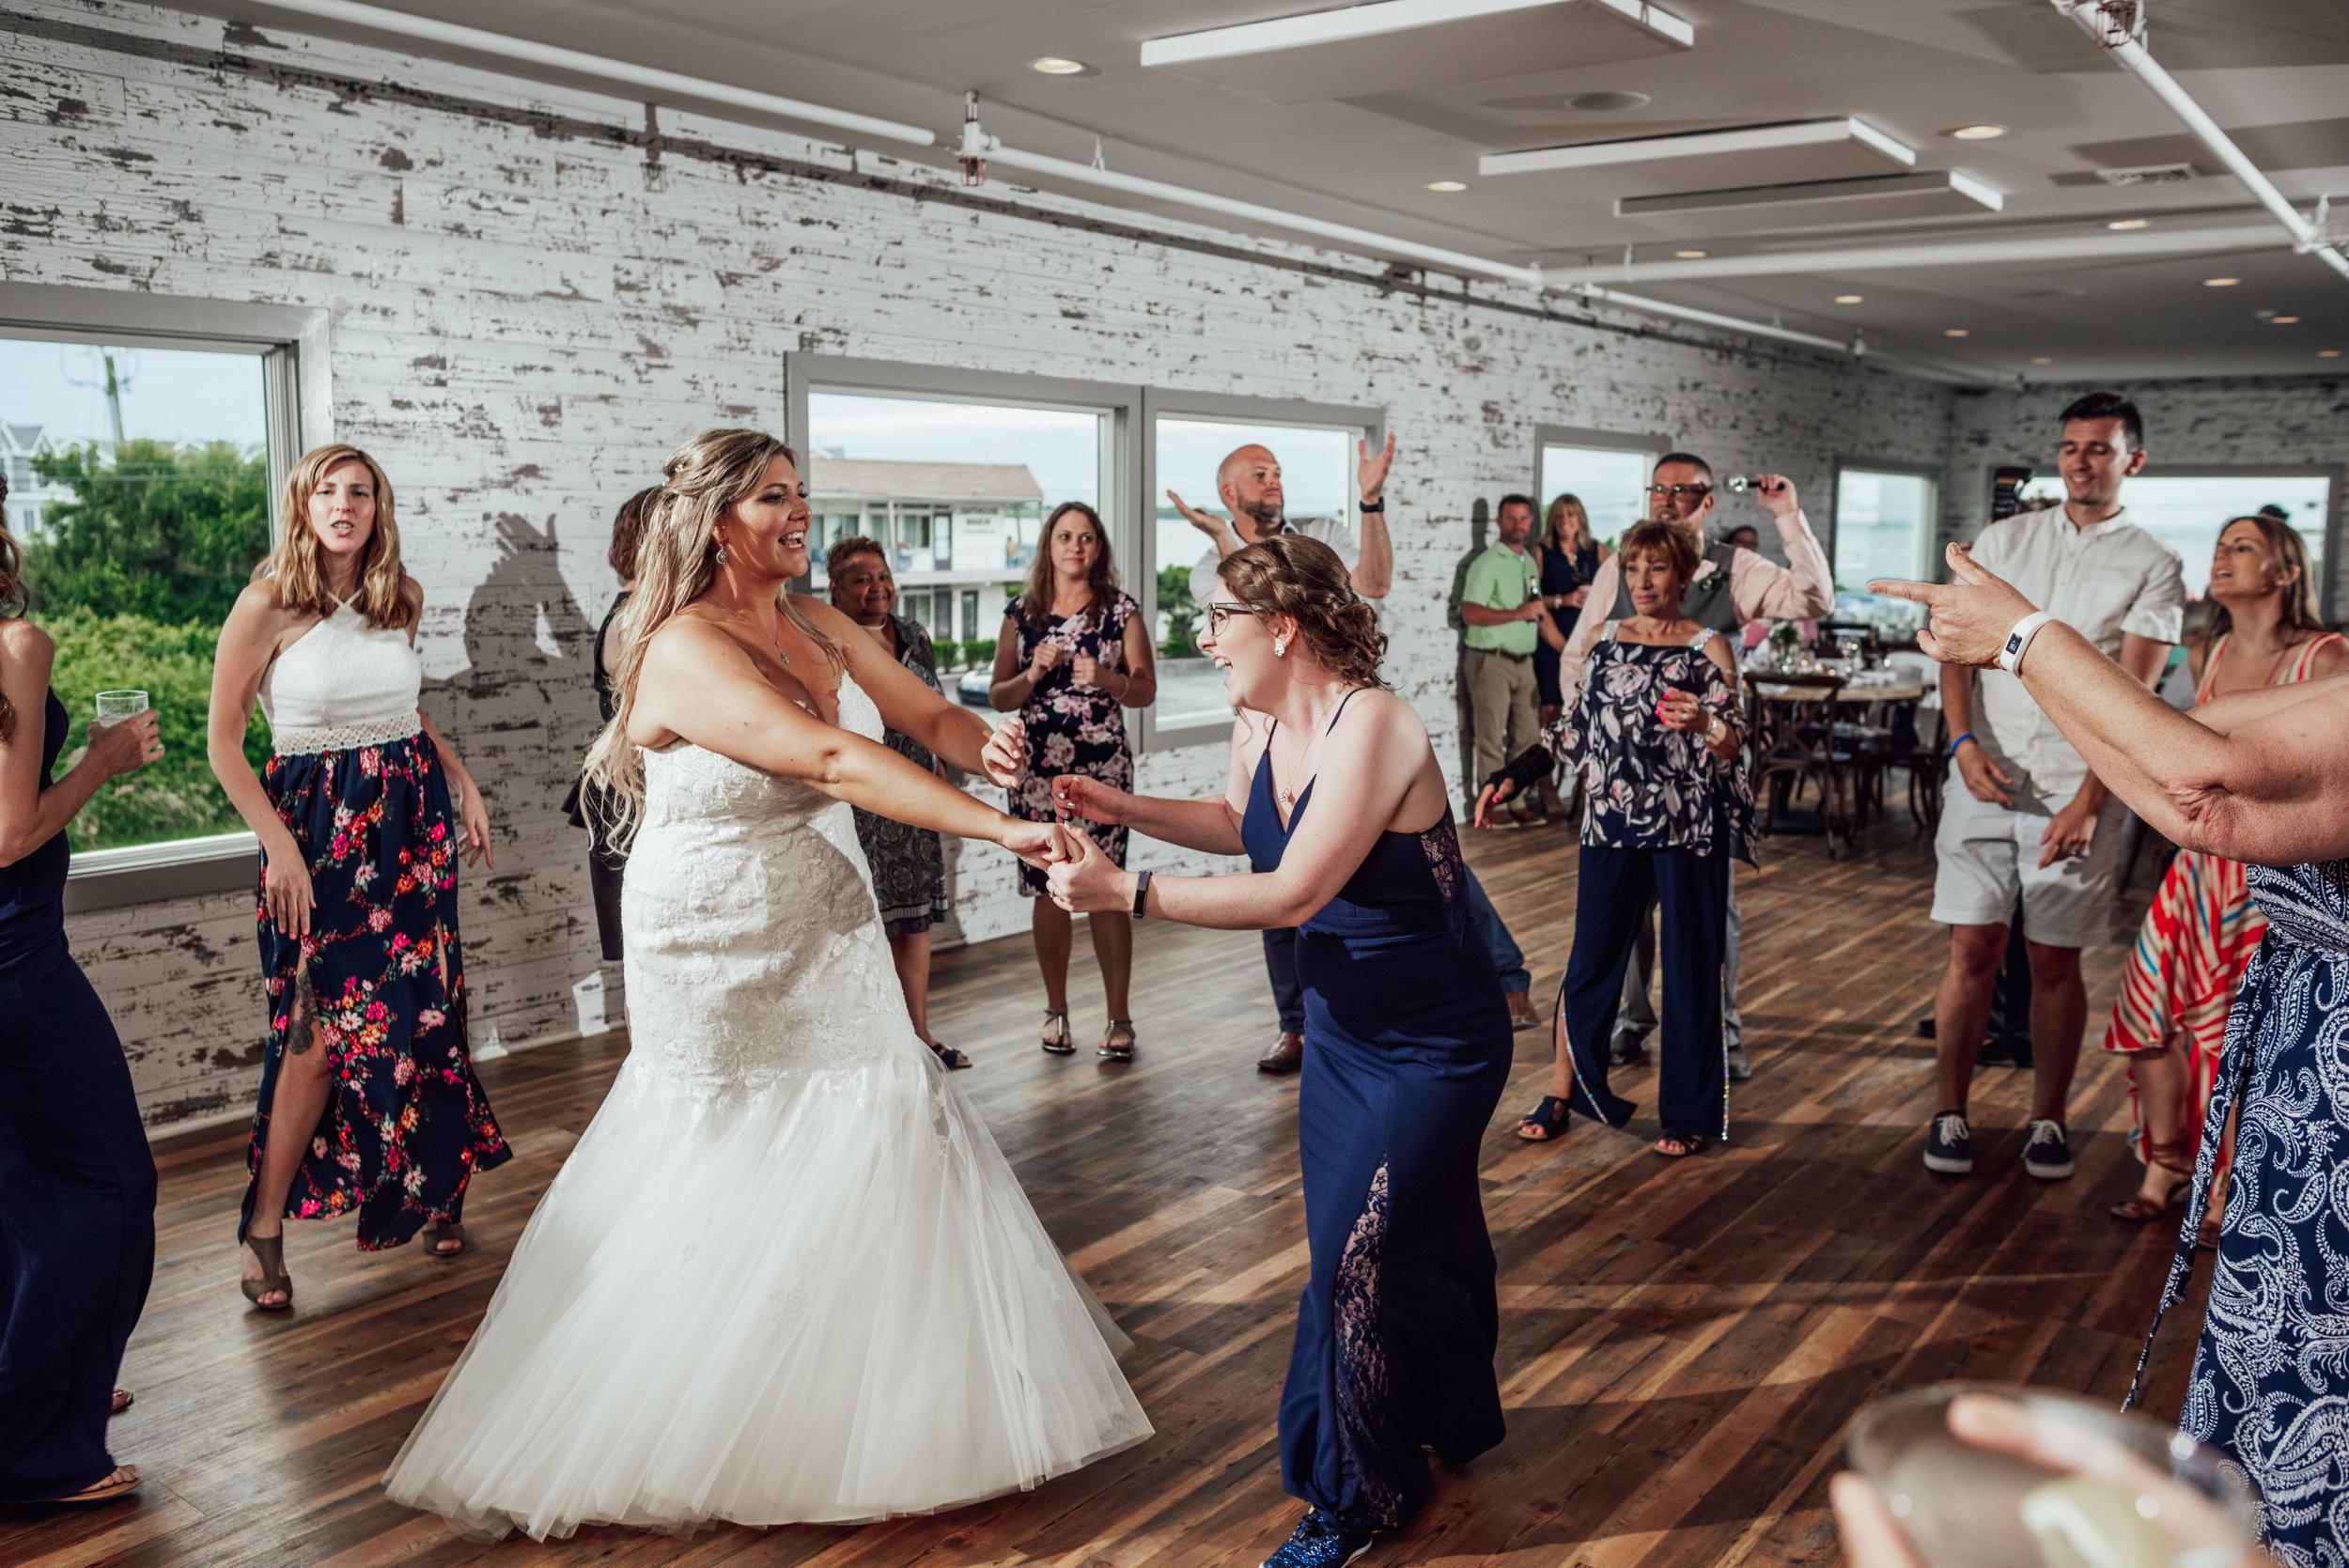 New Jersey Wedding Photographer, Felsberg Photography LBI wedding photography 110.jpg